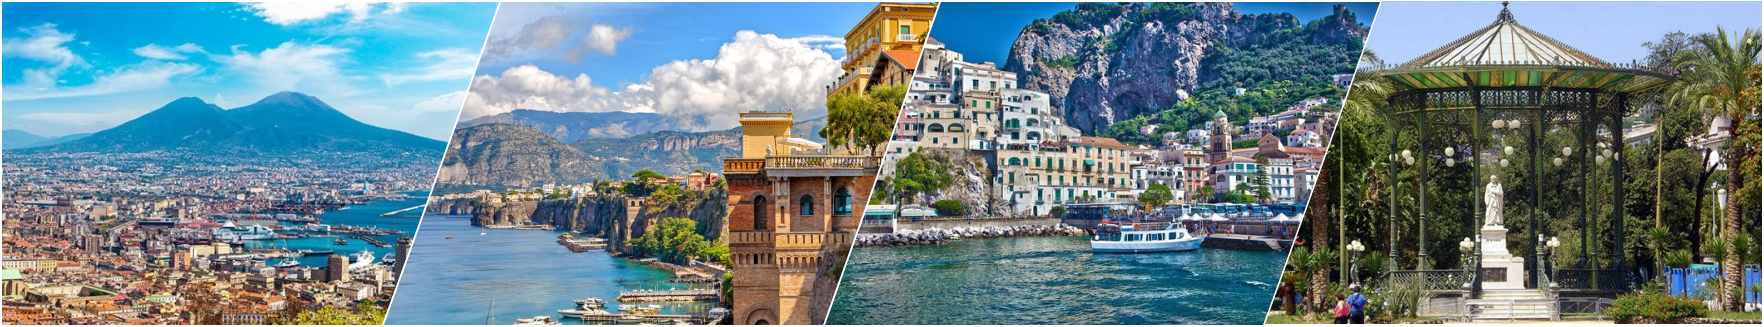 Naples_Sorrento_Salerno_VillaComunale